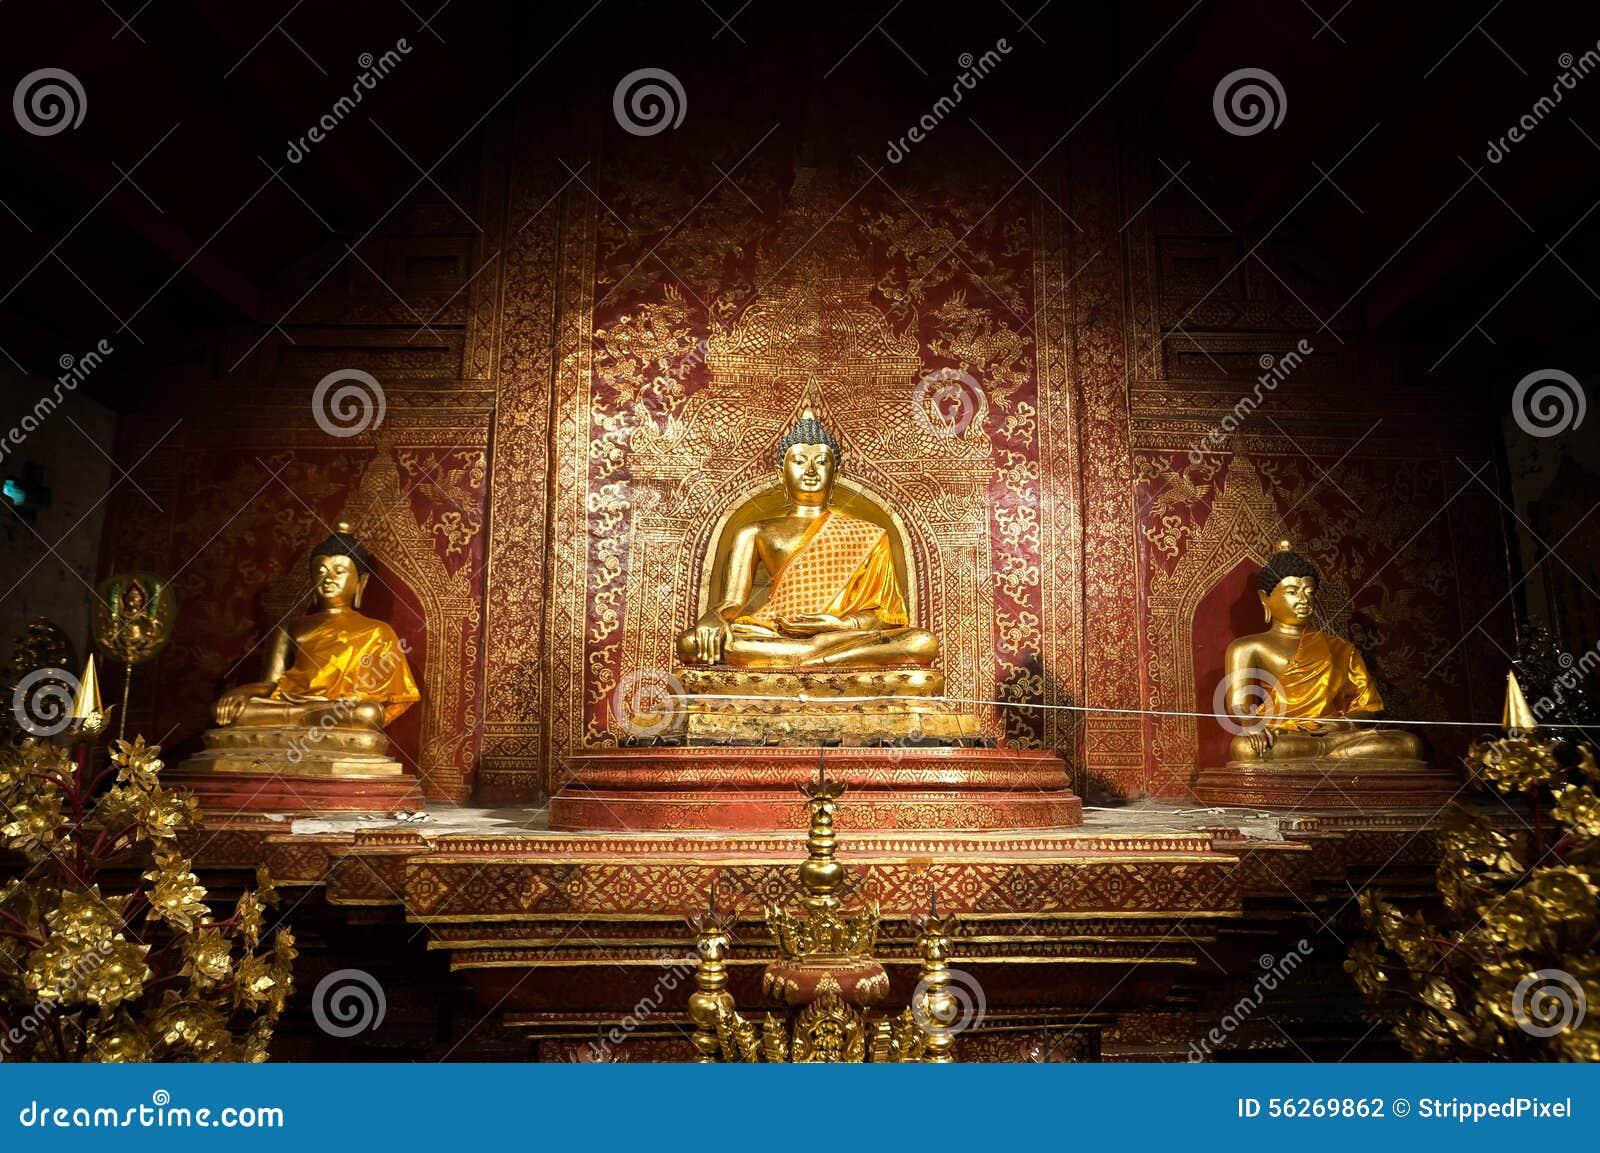 Download Phra Singh Buddha At Wat Phra Singh, Chiang Mai, Thailand Stock Photo - Image of buddhism, interior: 56269862